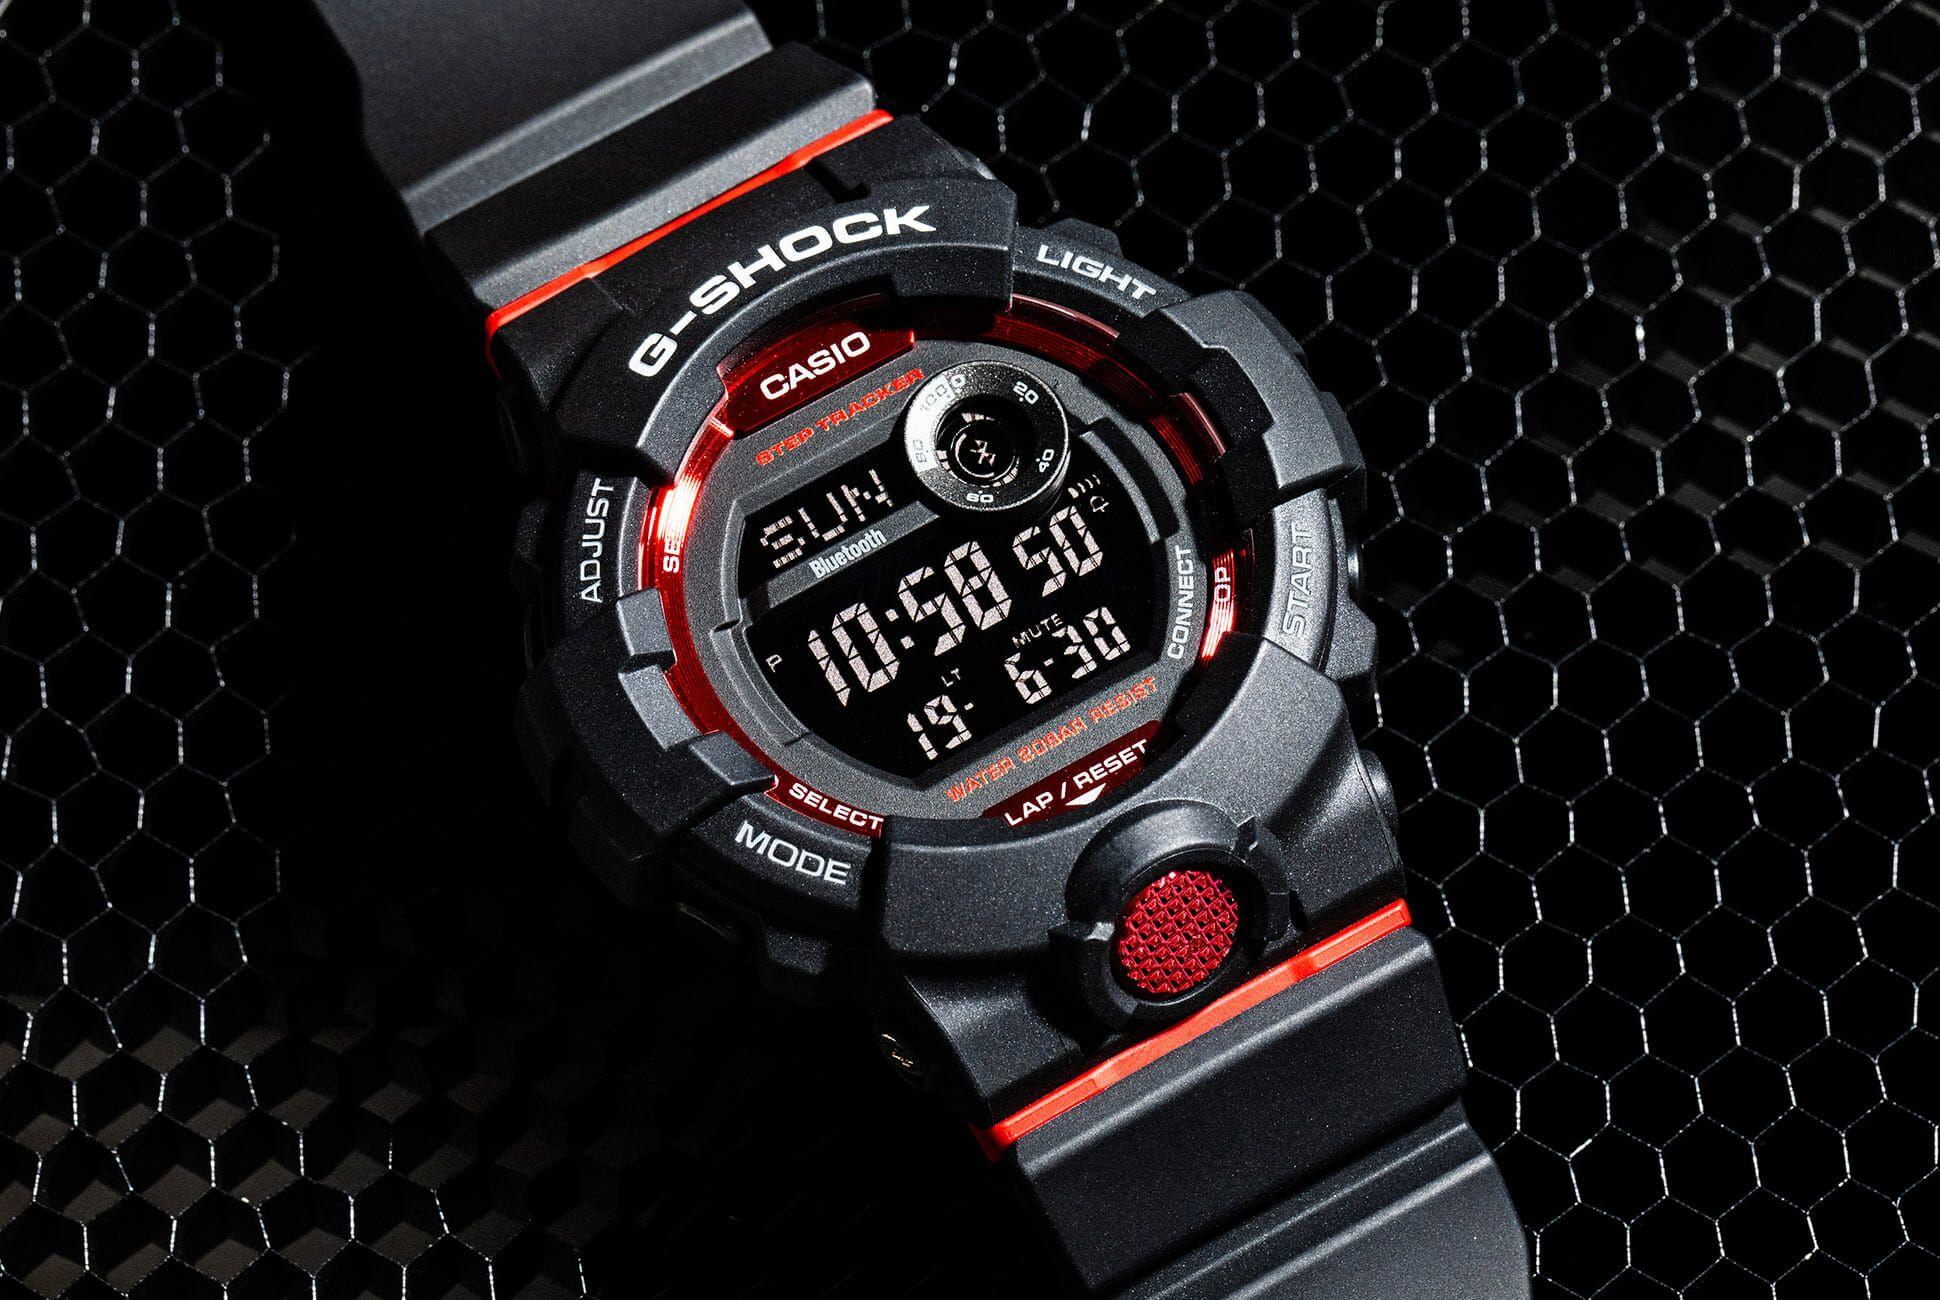 Sponsored-Casio-G-Shock-GBD800-gear-patrol-slide-1